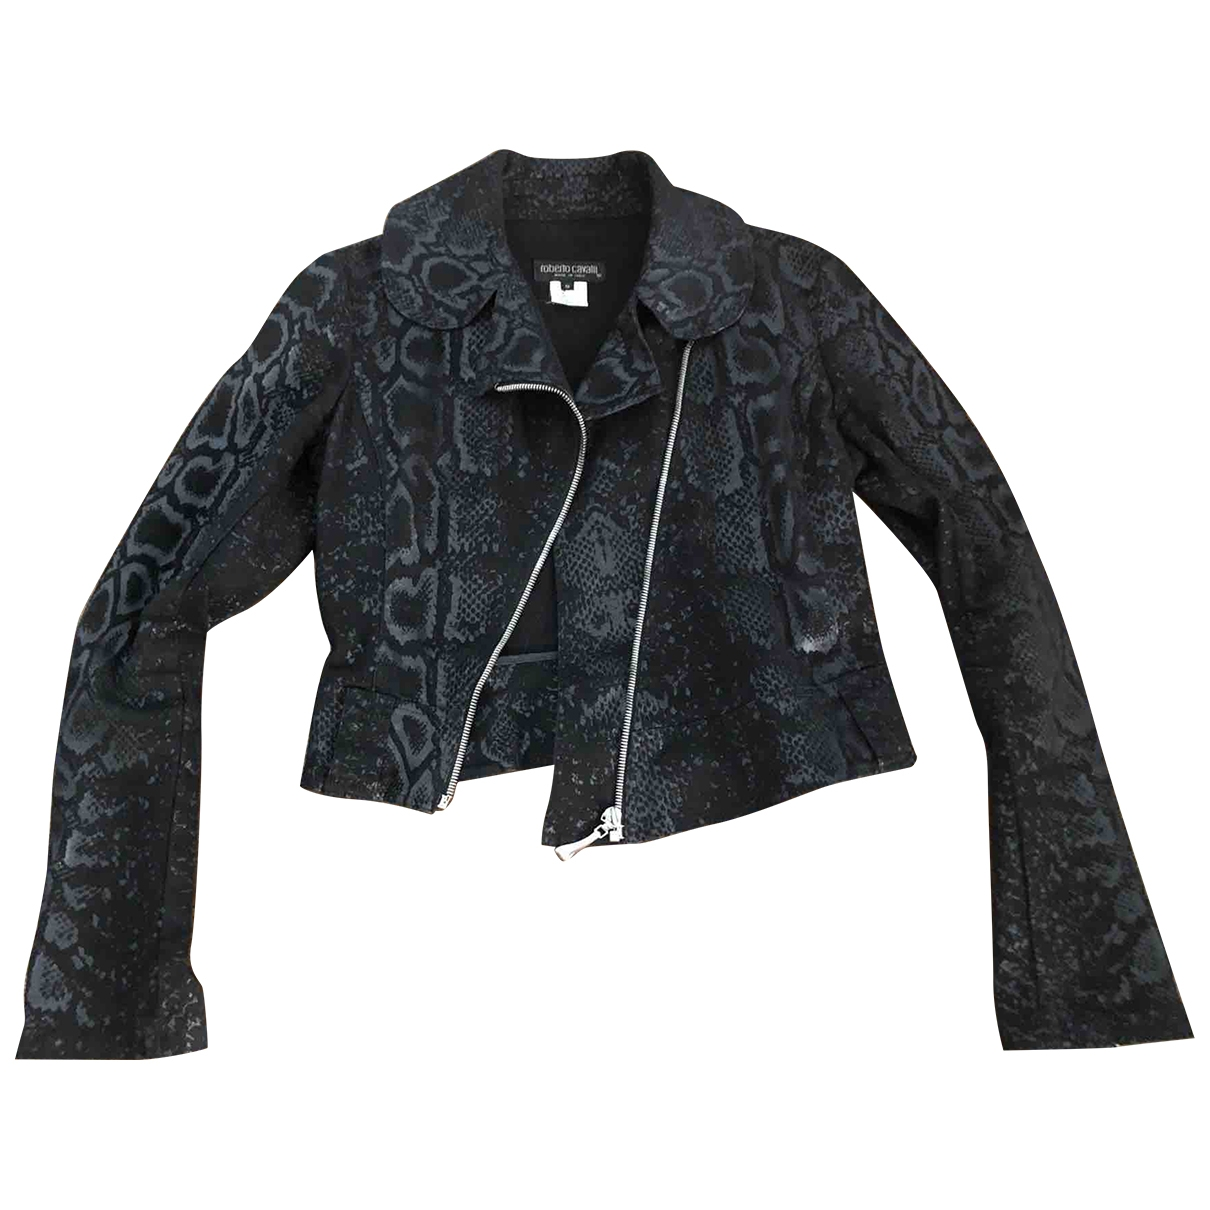 Roberto Cavalli \N Black Cotton jacket for Women 36 IT